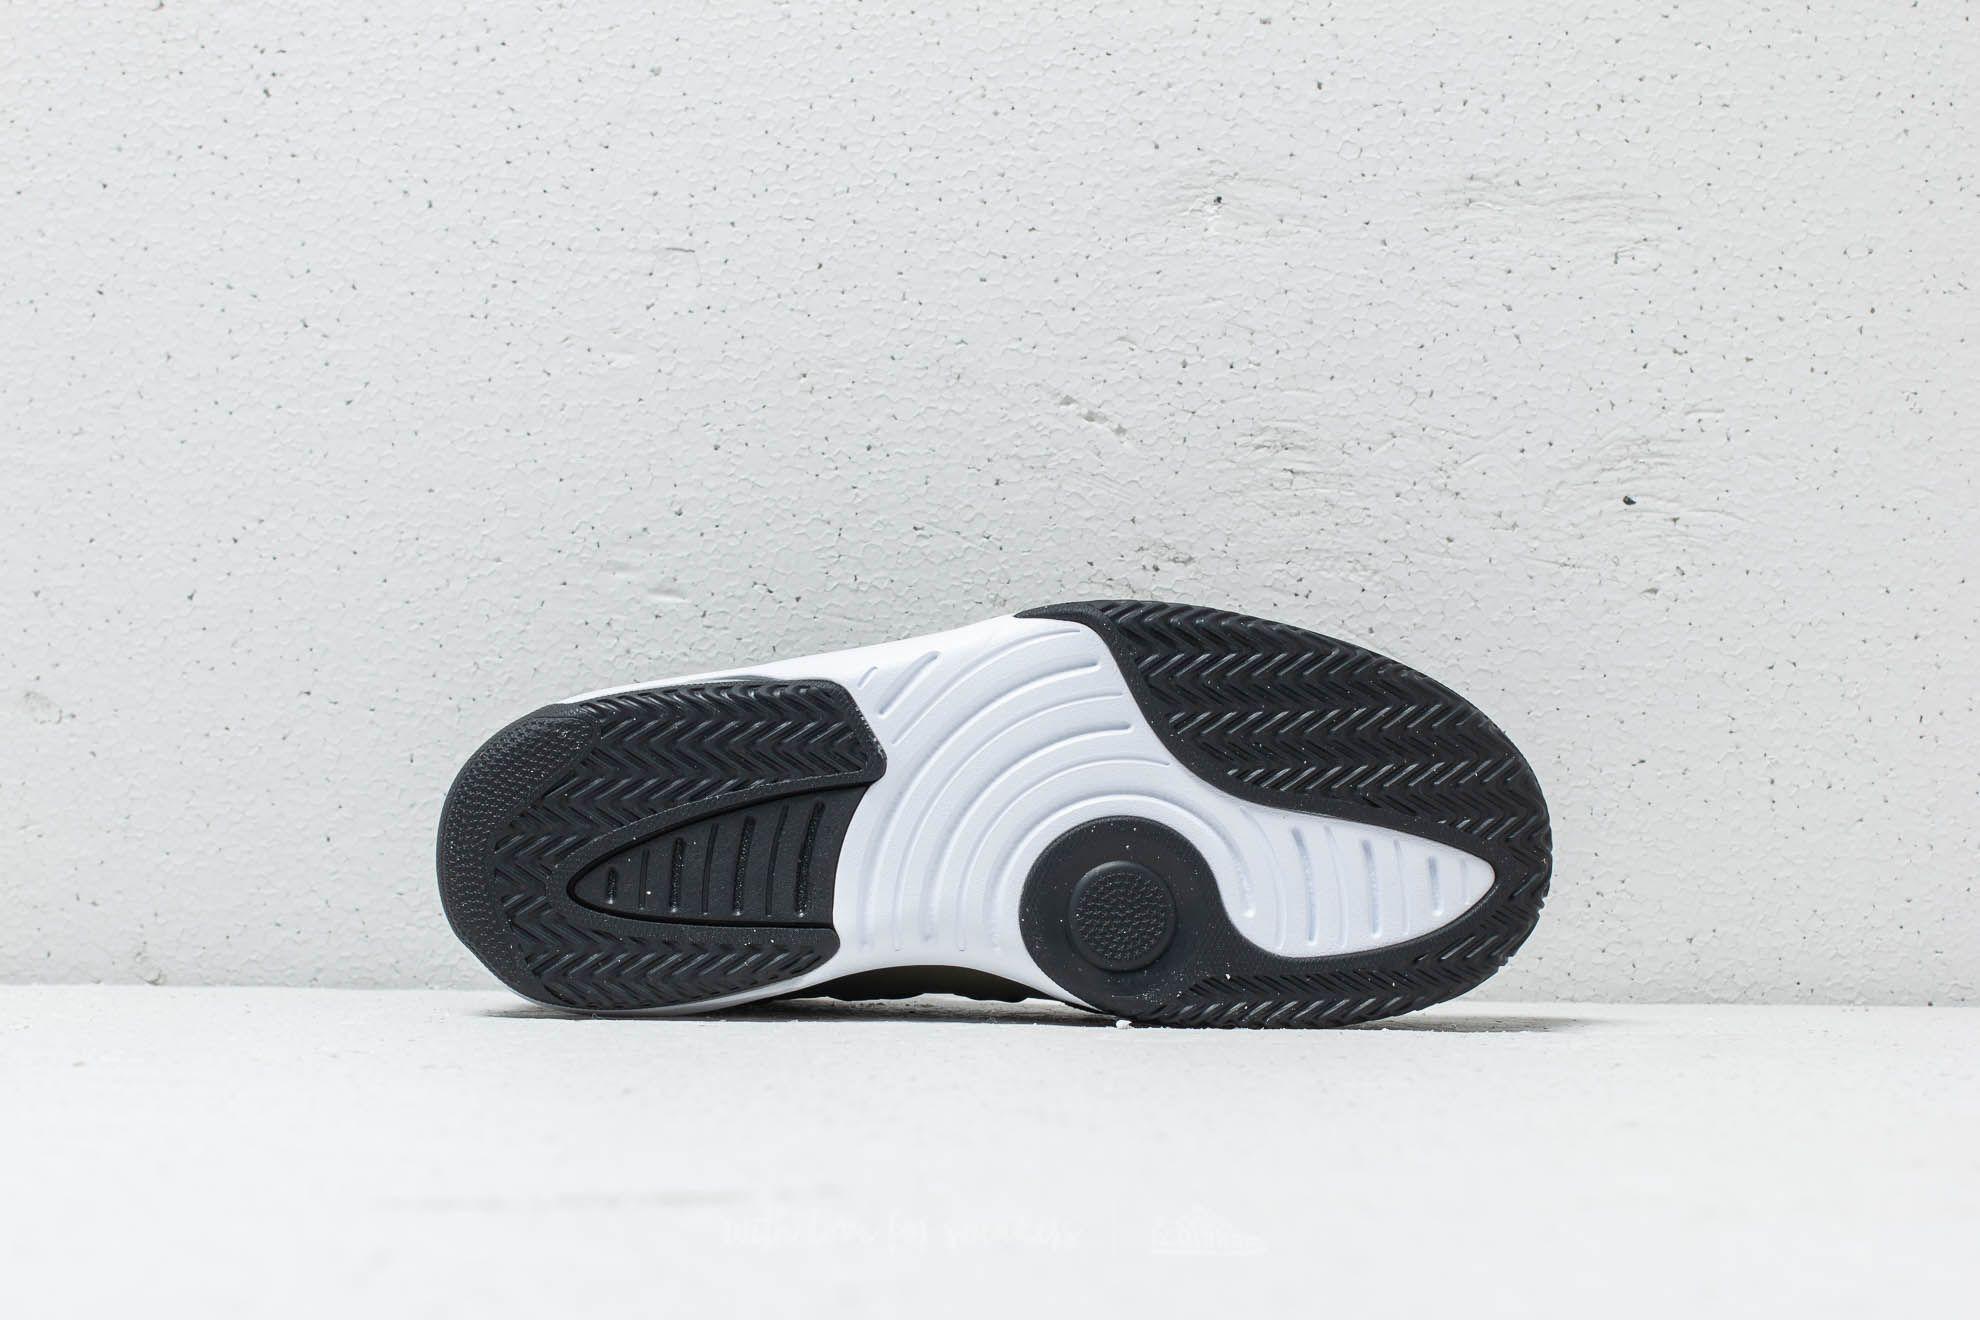 Olive Max Jordan Canvas Aura Black Footshop White Tx86A0w6q